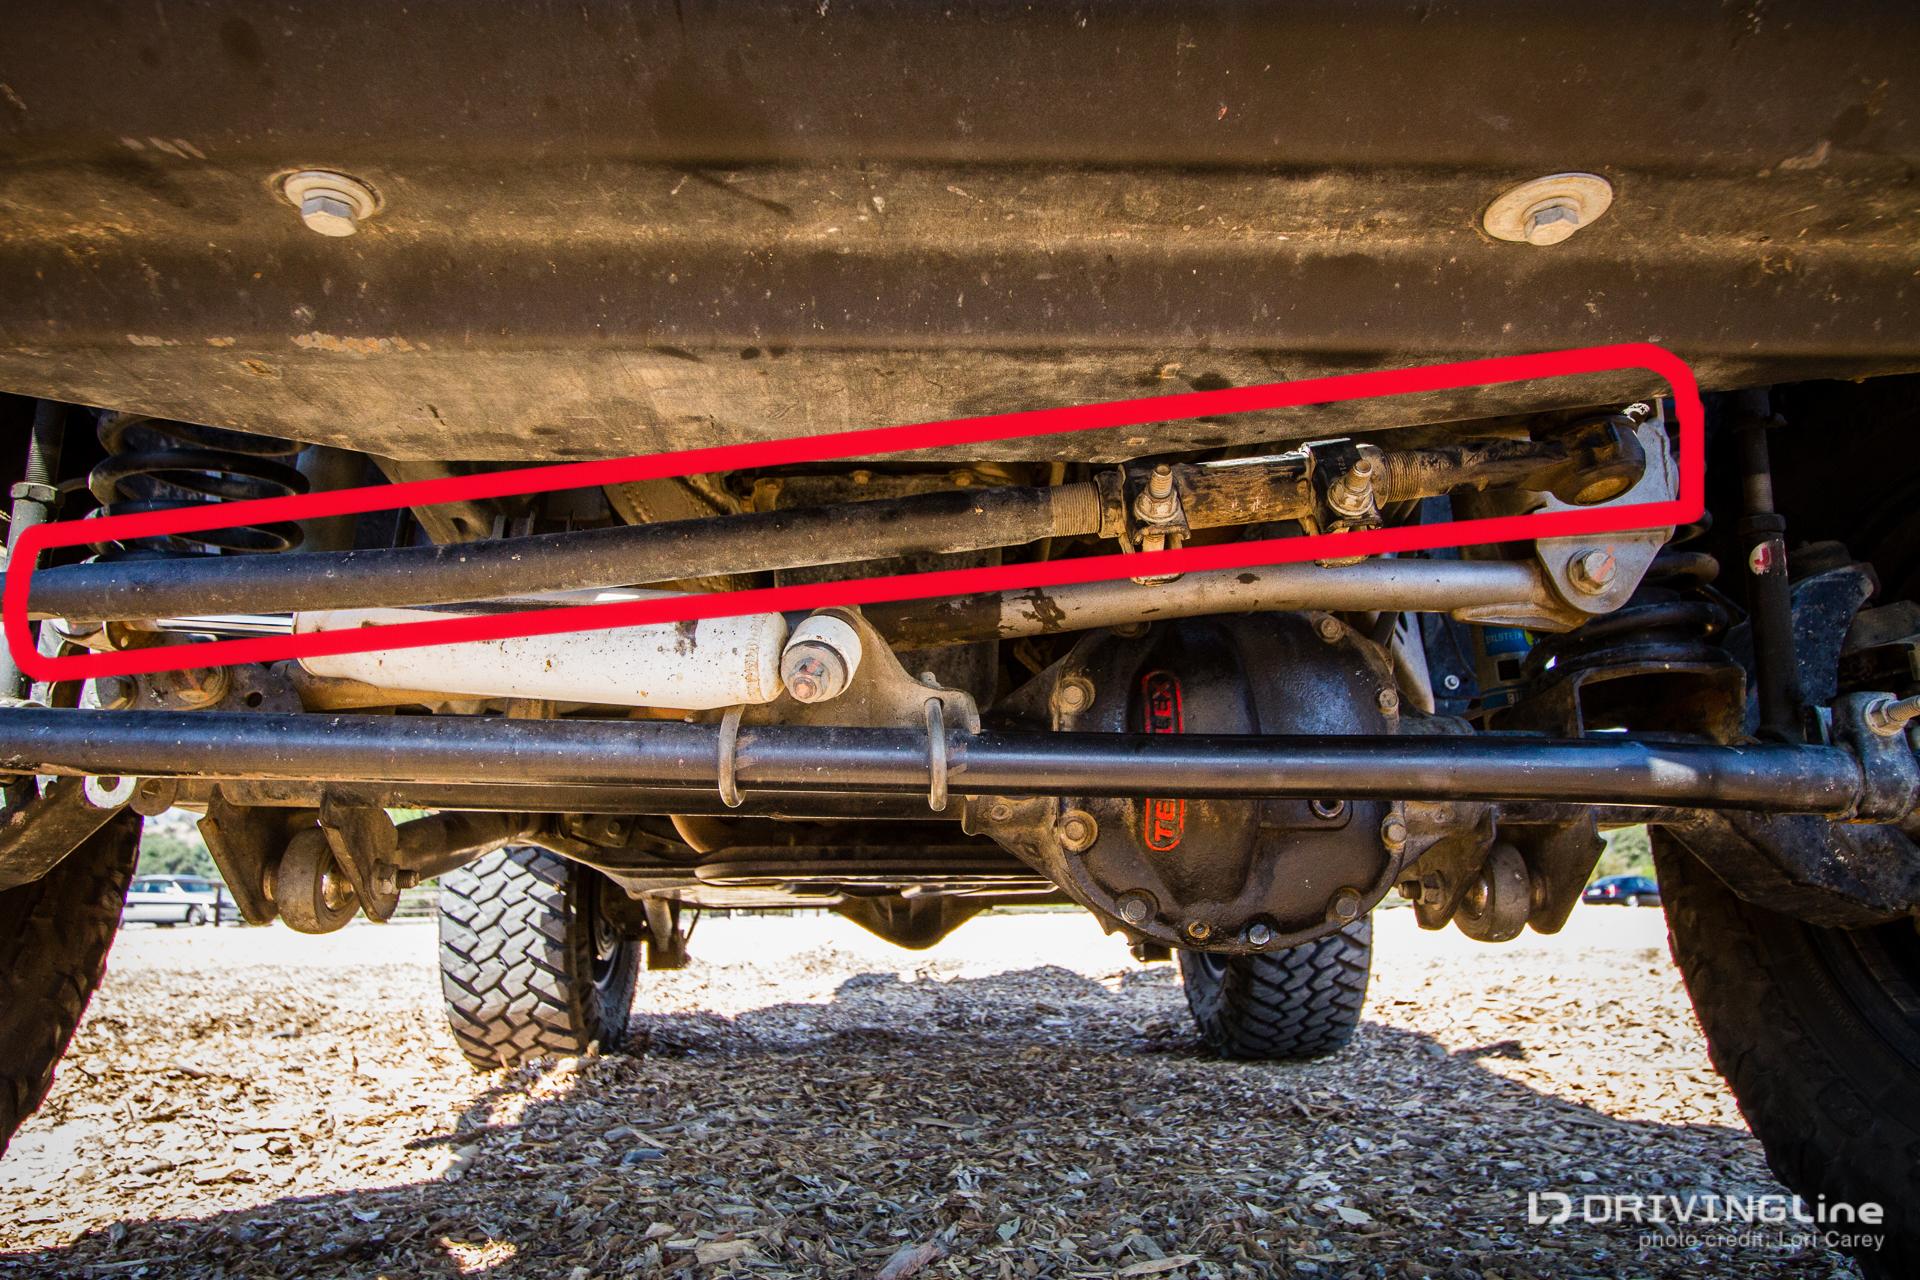 Vehicle Tire Lock